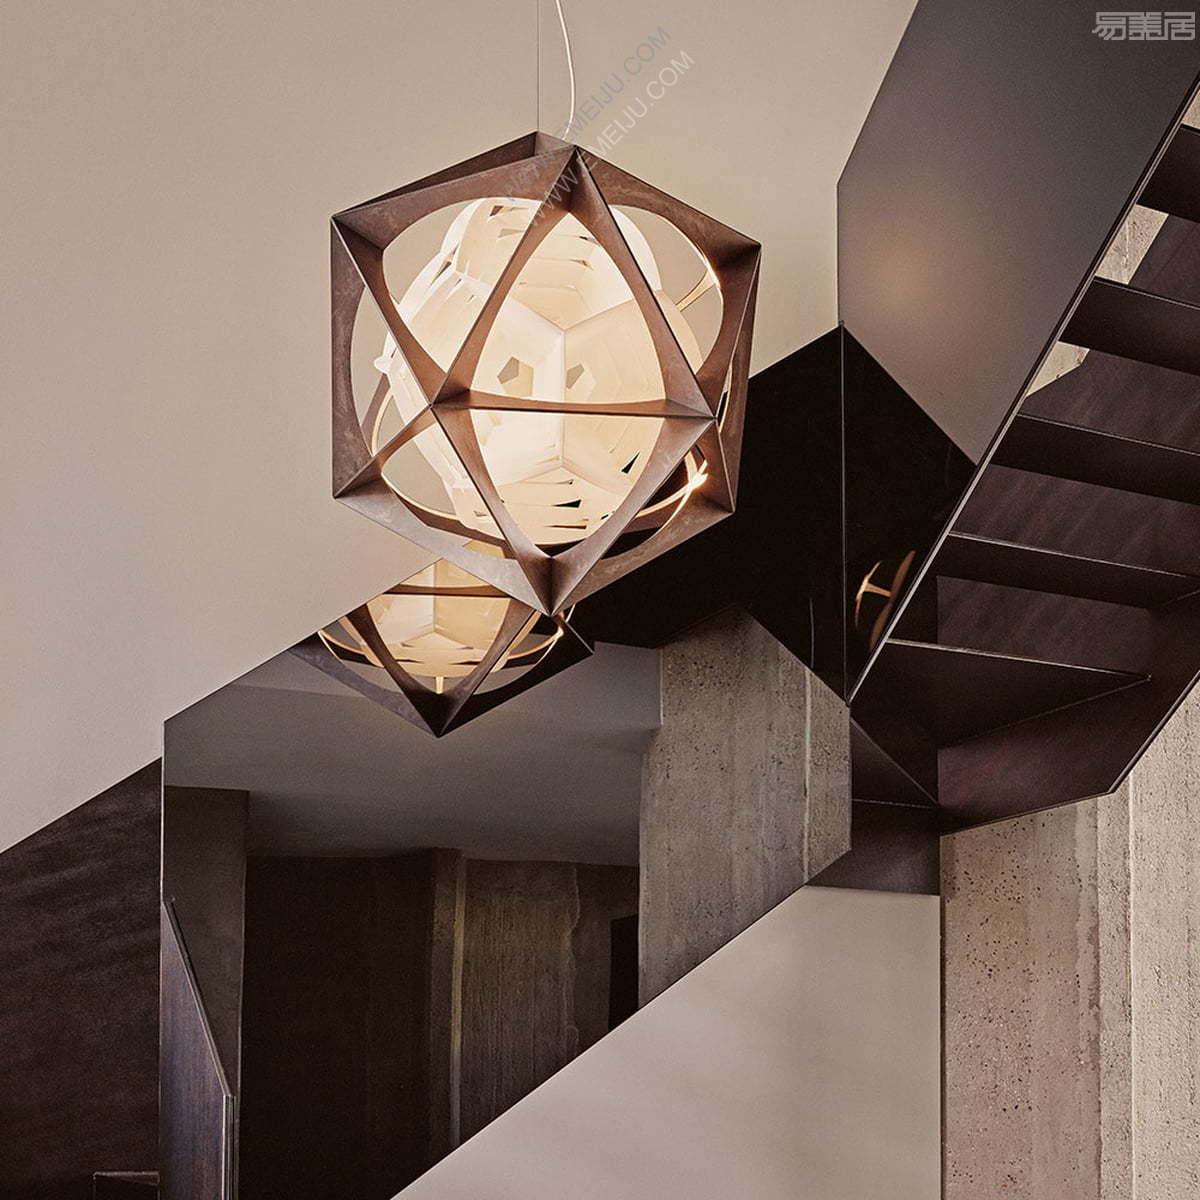 Louis-Poulsen-OE-Quasi-Light-LED-Pendelleuchte-DALI-Aluminium-dunkel-Ambiente.jpg